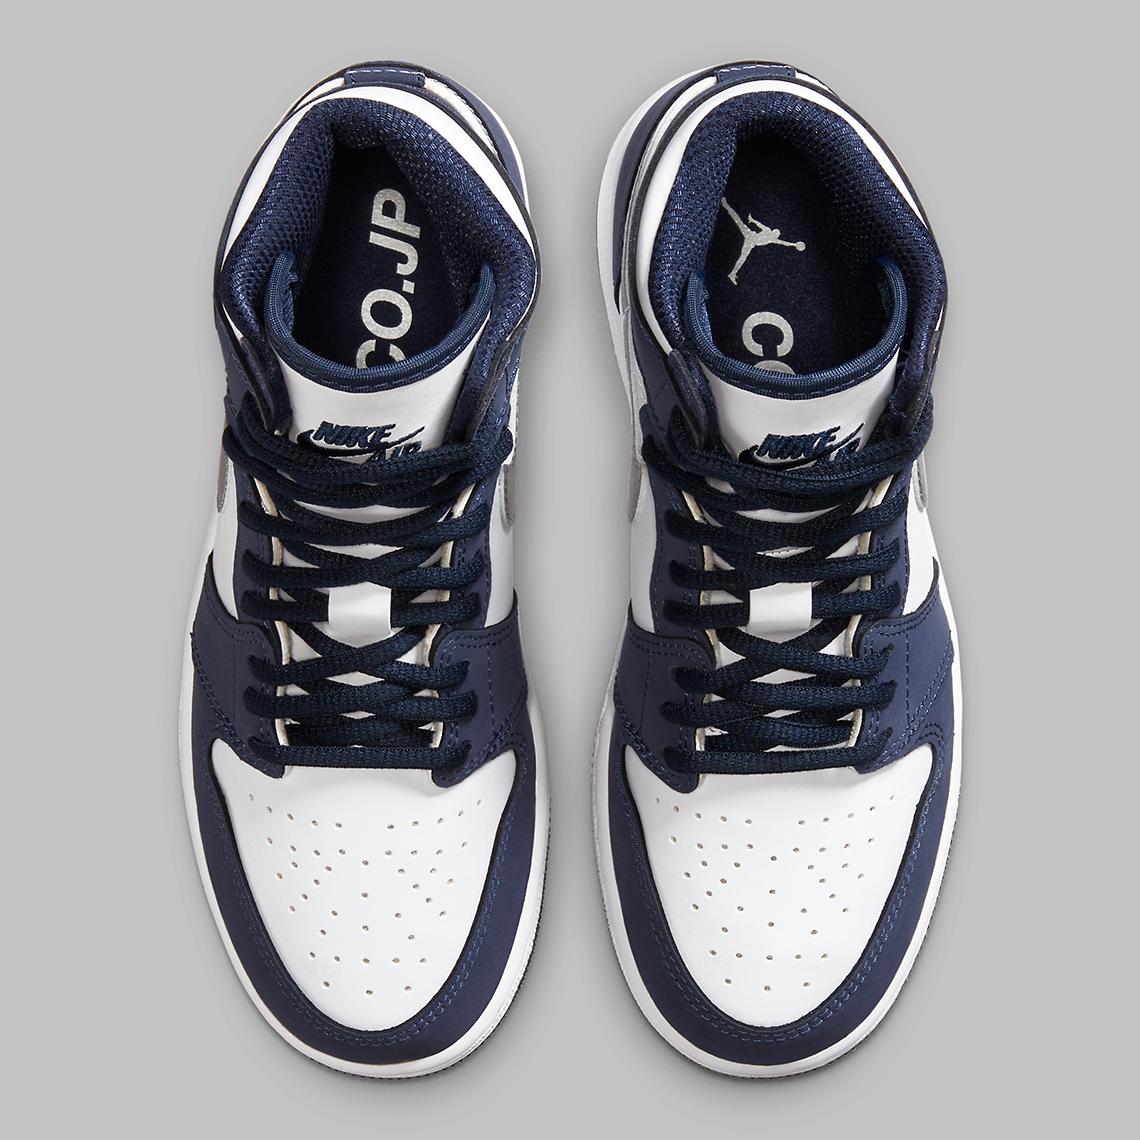 Air Jordan 1 High Midnight Navy 575441-141 | SneakerNews.com